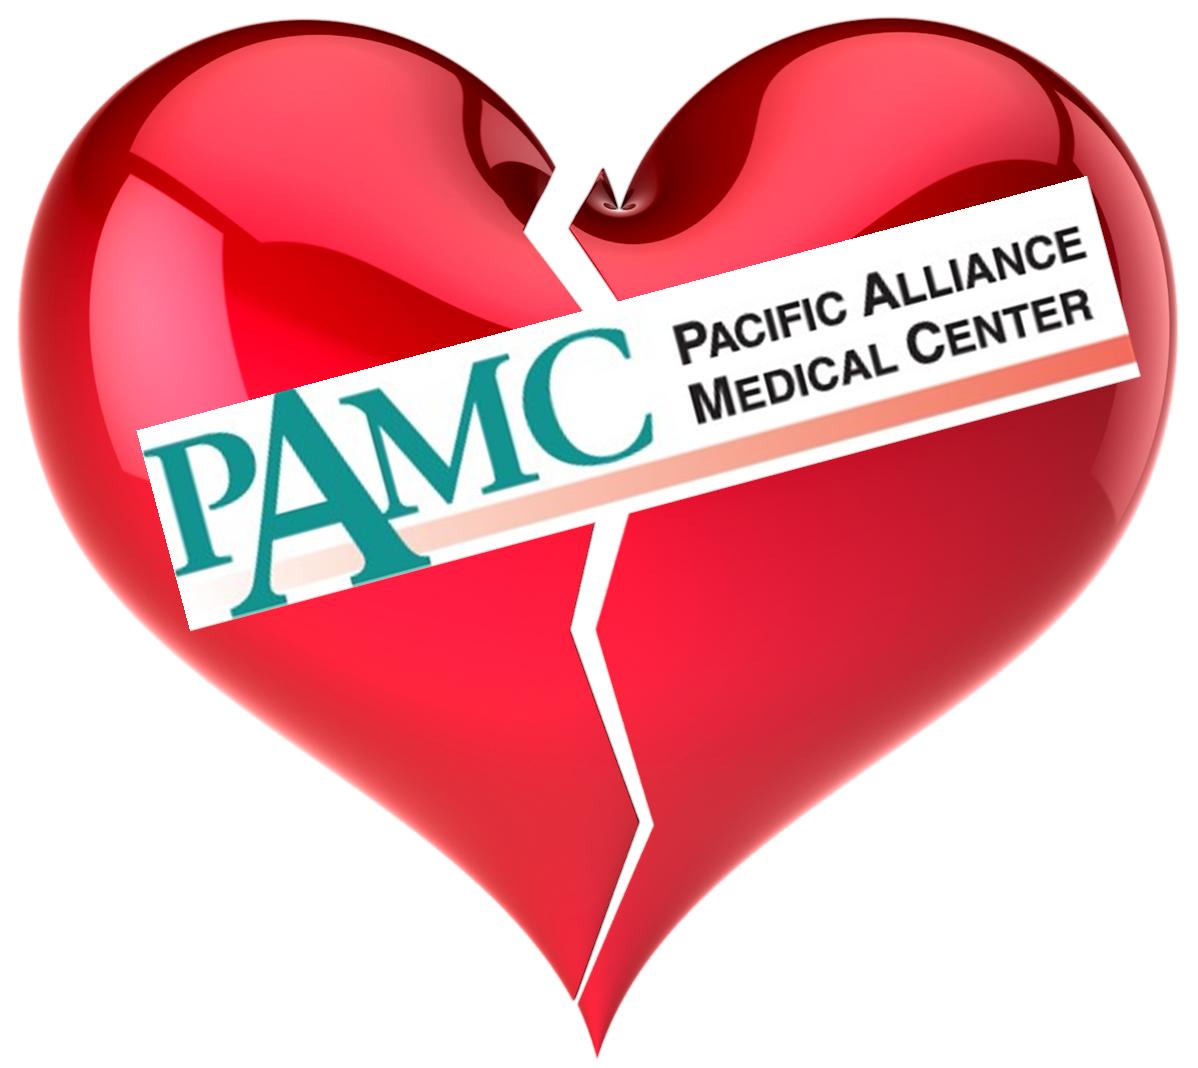 Am I Next? Pacific Alliance Medical Center closing, layoffs